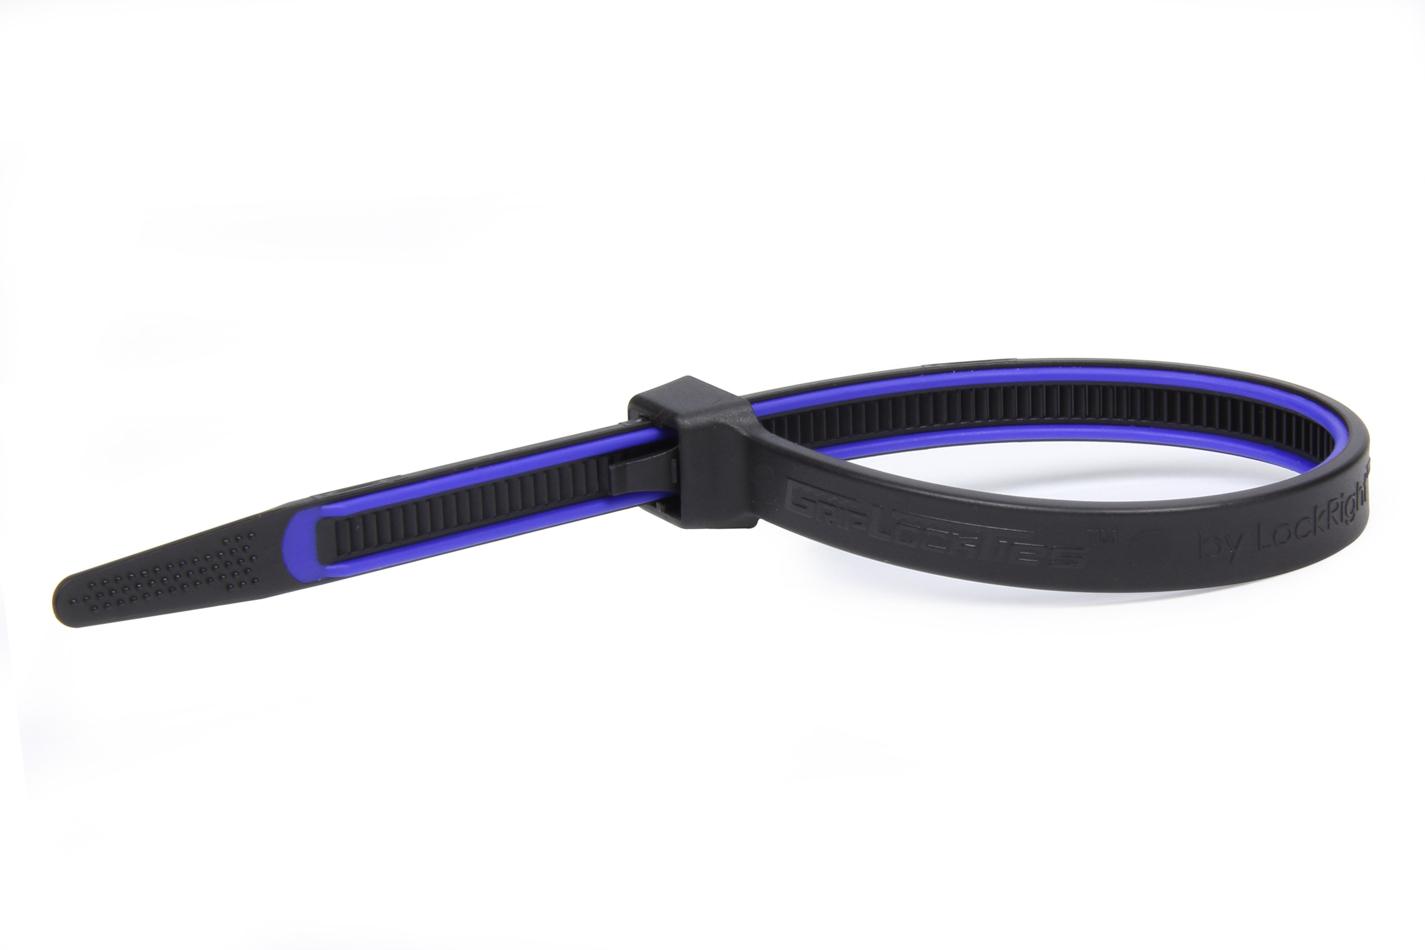 Grip Lock Ties 2908BKBUHB15 Cable Ties, Zip Ties, 8 in Long, Blue Rubber Lined, Nylon, Black, Reusable, Set of 15